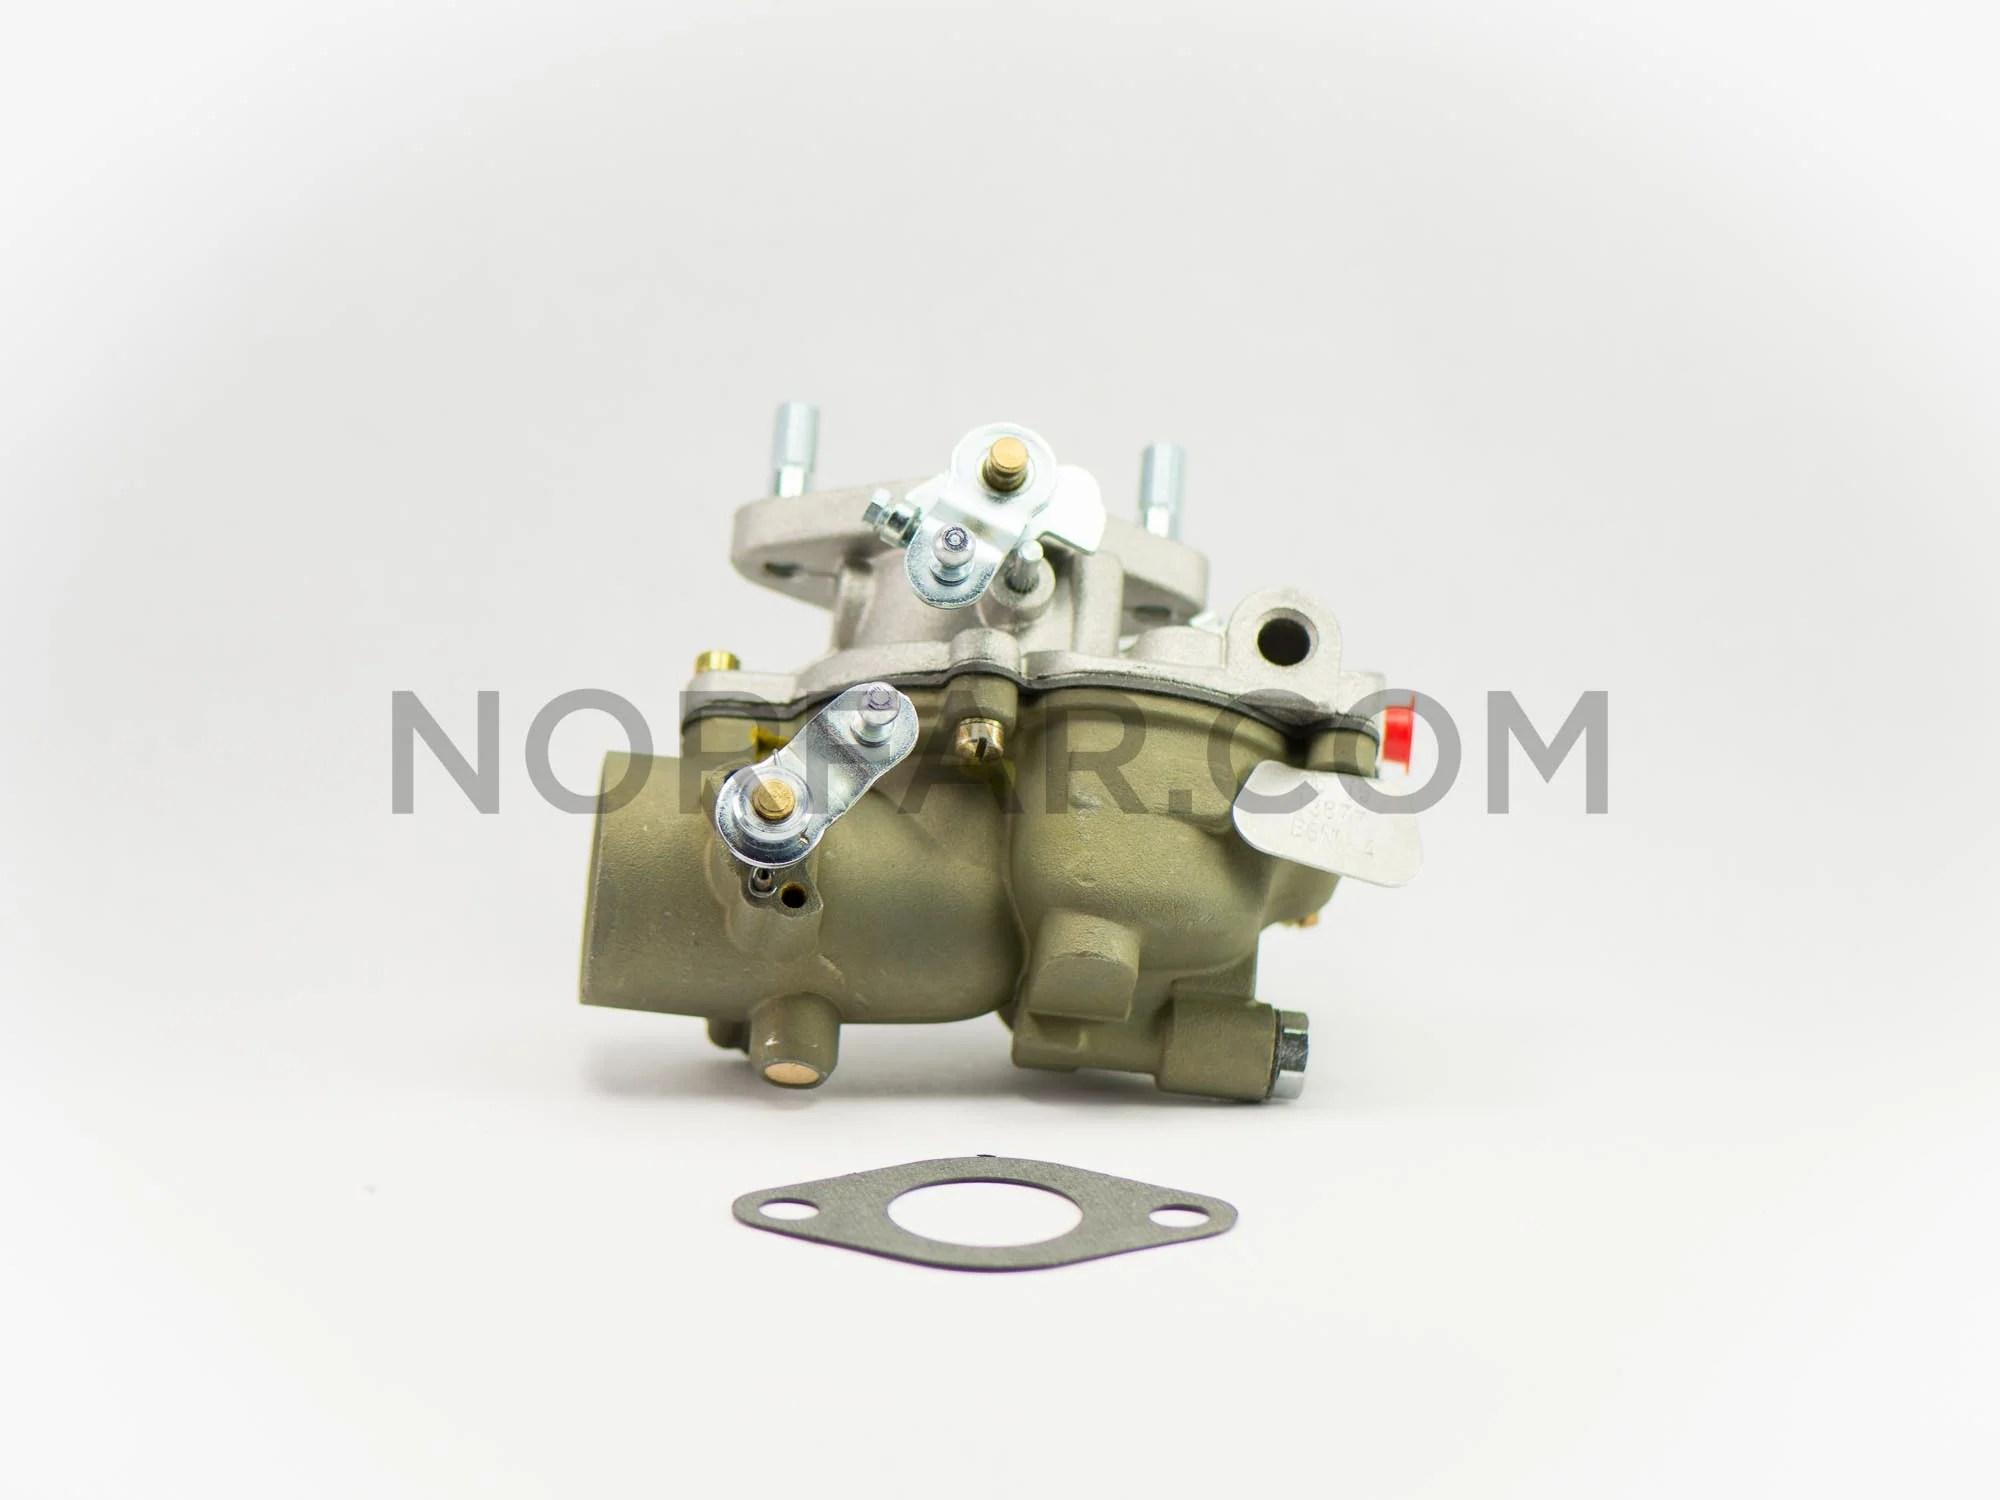 zenith 13877 carburetor ford b6nn9510 a norfar com farmall super h carburetor diagram zenith 13877 carburetor [ 2000 x 1500 Pixel ]